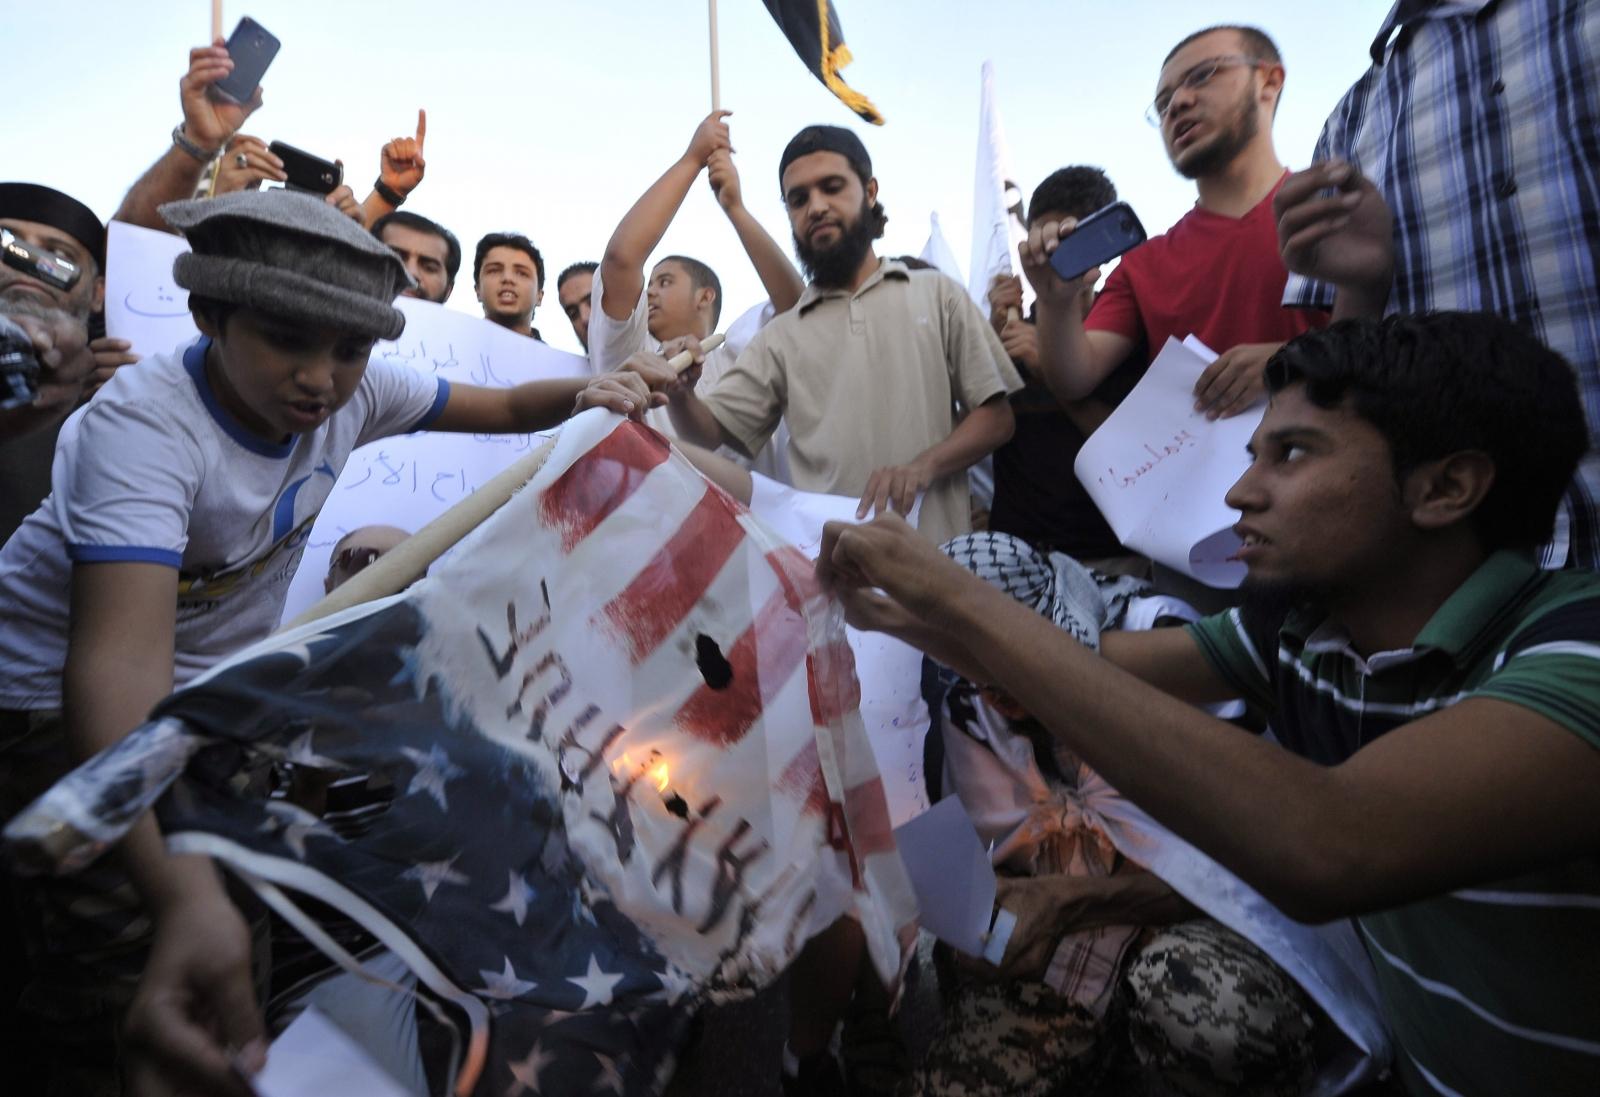 Libyan protesters burn American flag over al-Libi's arrest